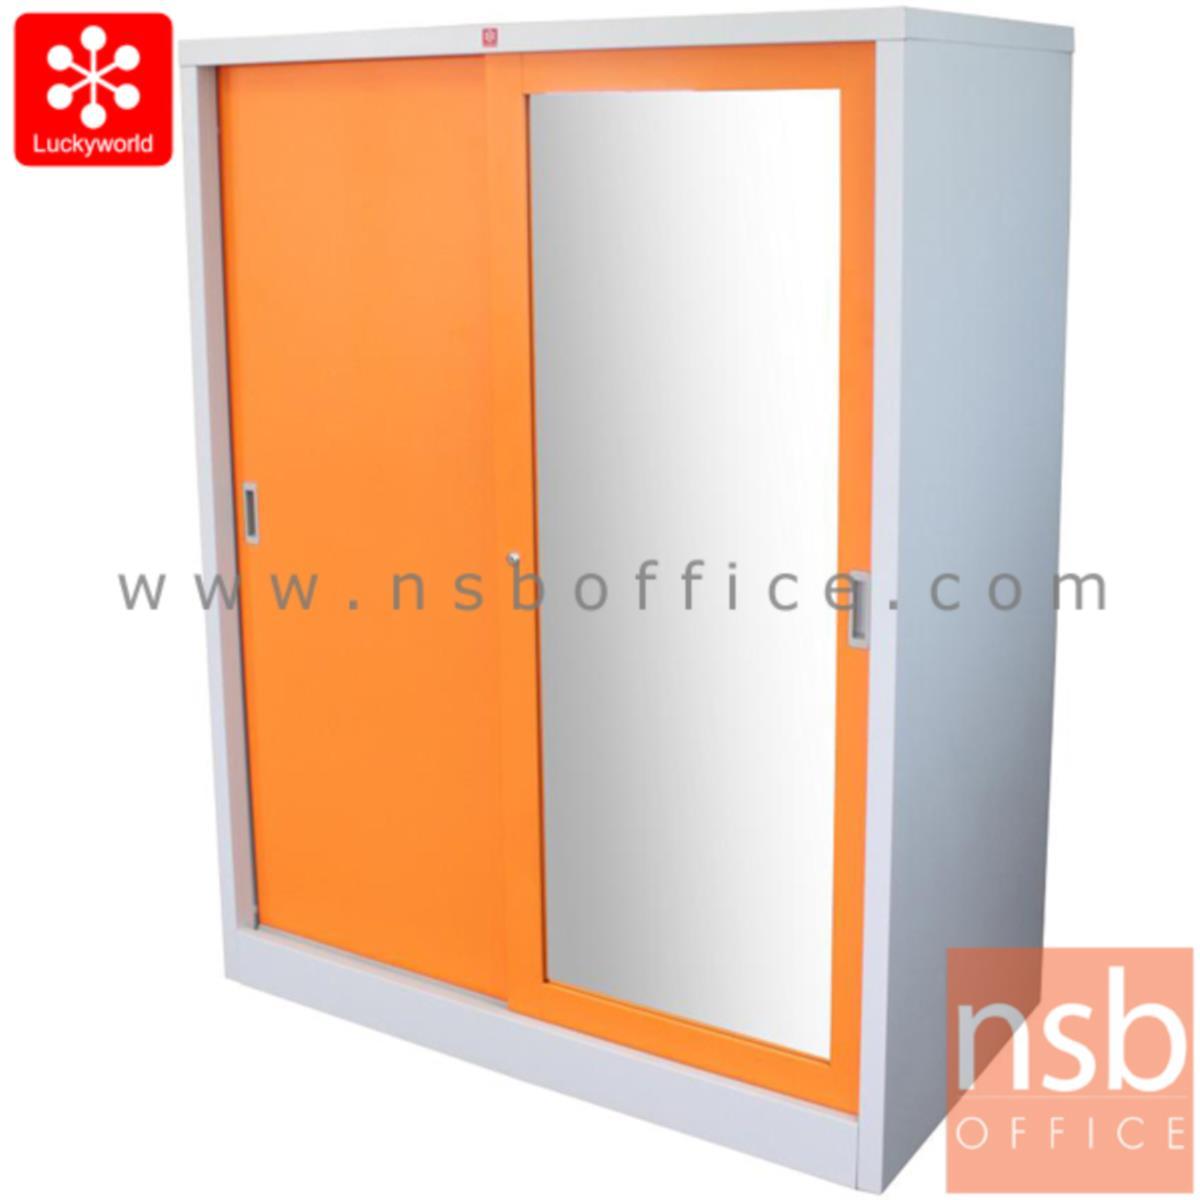 E31A070:ตู้เสื้อผ้าเตี้ย บานเลื่อน บานทึบ/บานกระจกเงา H152.5 cm. KSV-152K